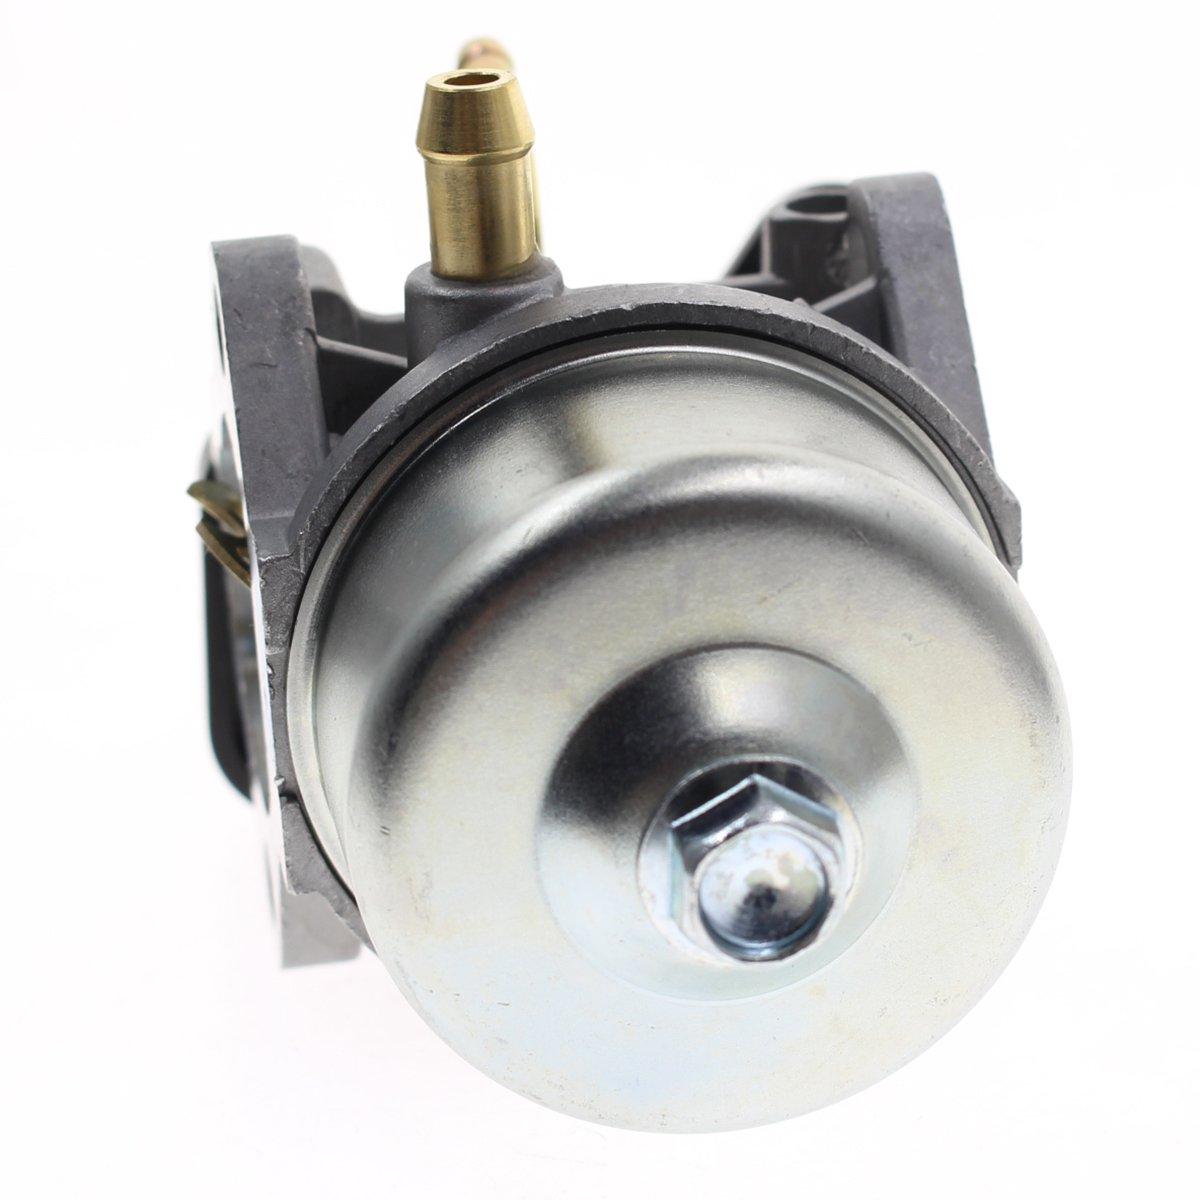 Carbhub Carburetor for Briggs & Stratton 801396 801233 801255 Snow Blower Carb by Carbhub (Image #5)